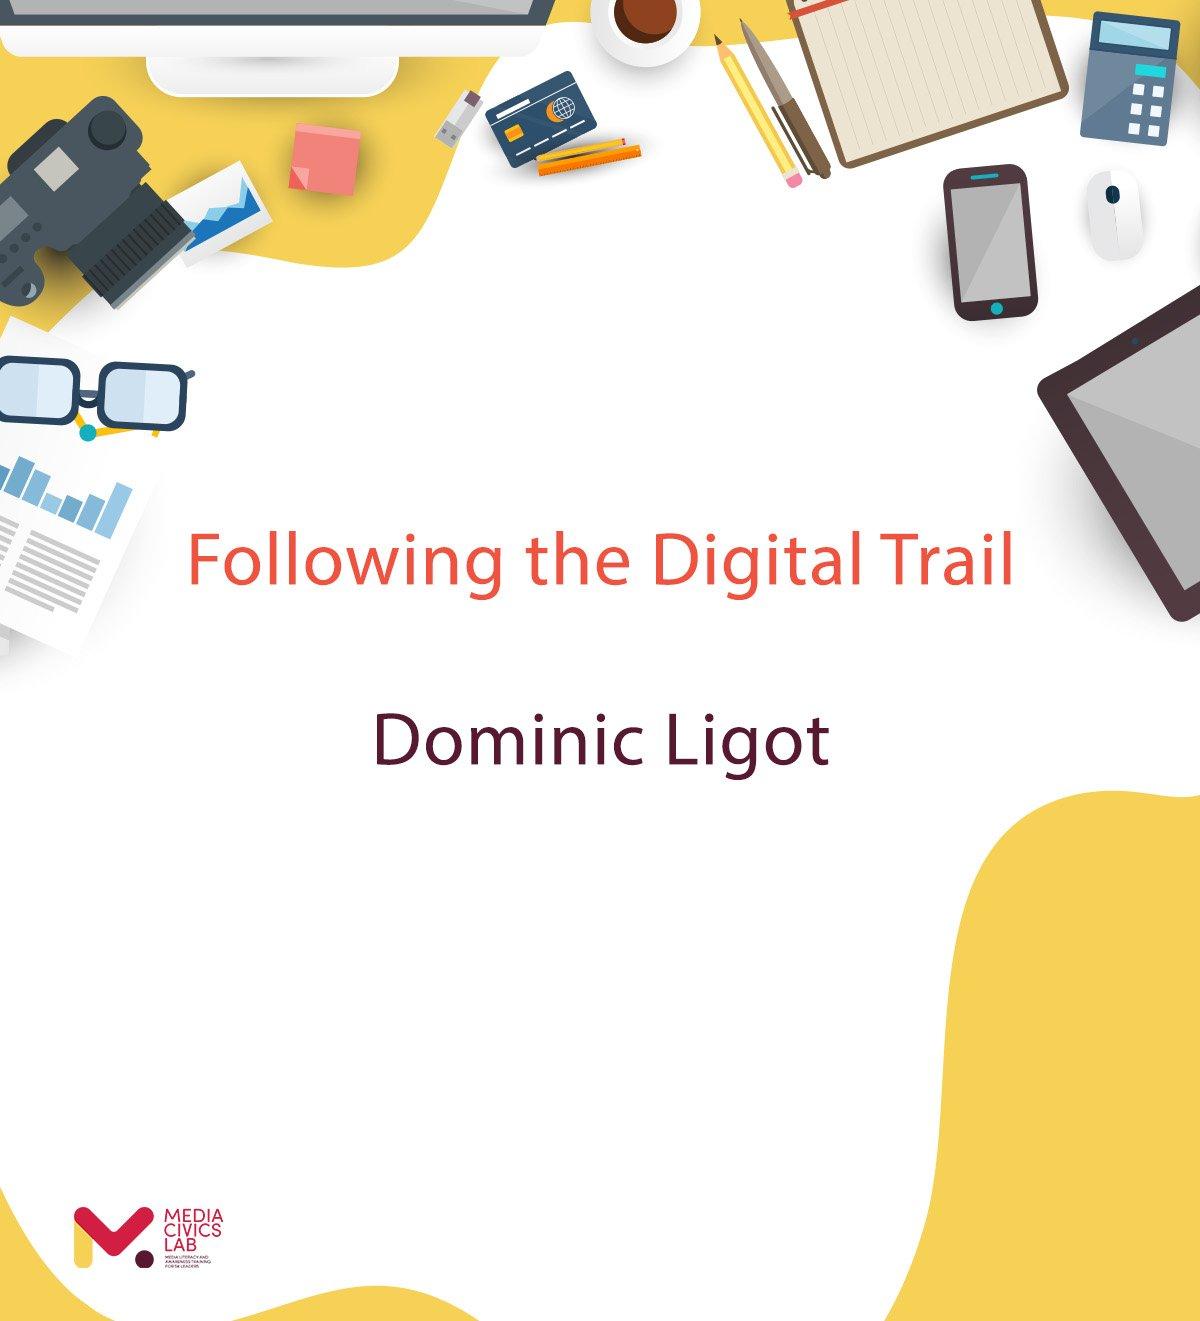 Following the Digital Trail – Dominic Ligot